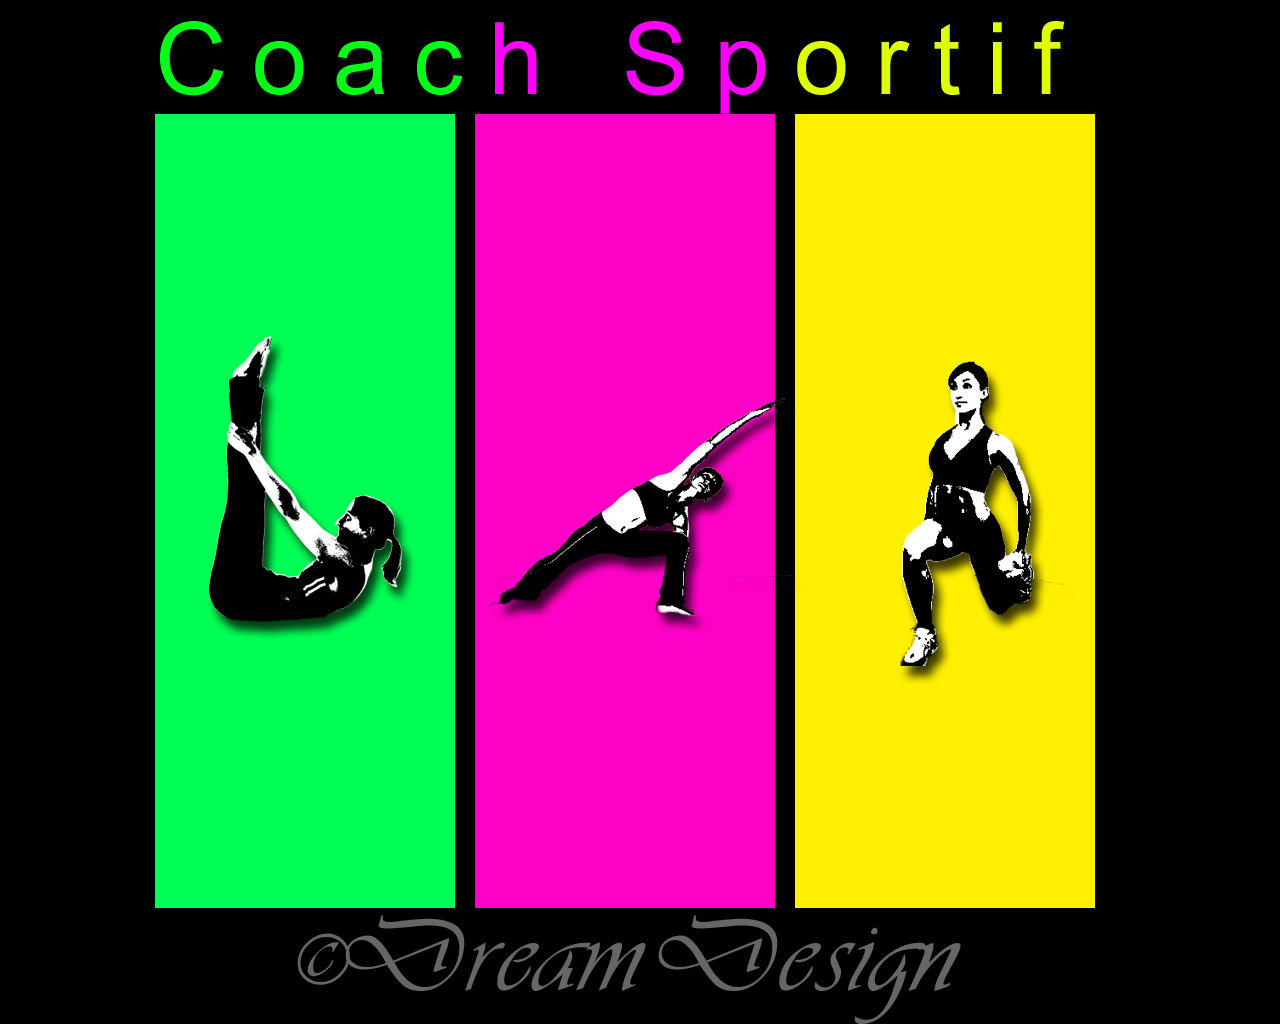 carte visite coach sportif 2.jpg: arbodbenjamin.wix.com/dreamdesign#!projets